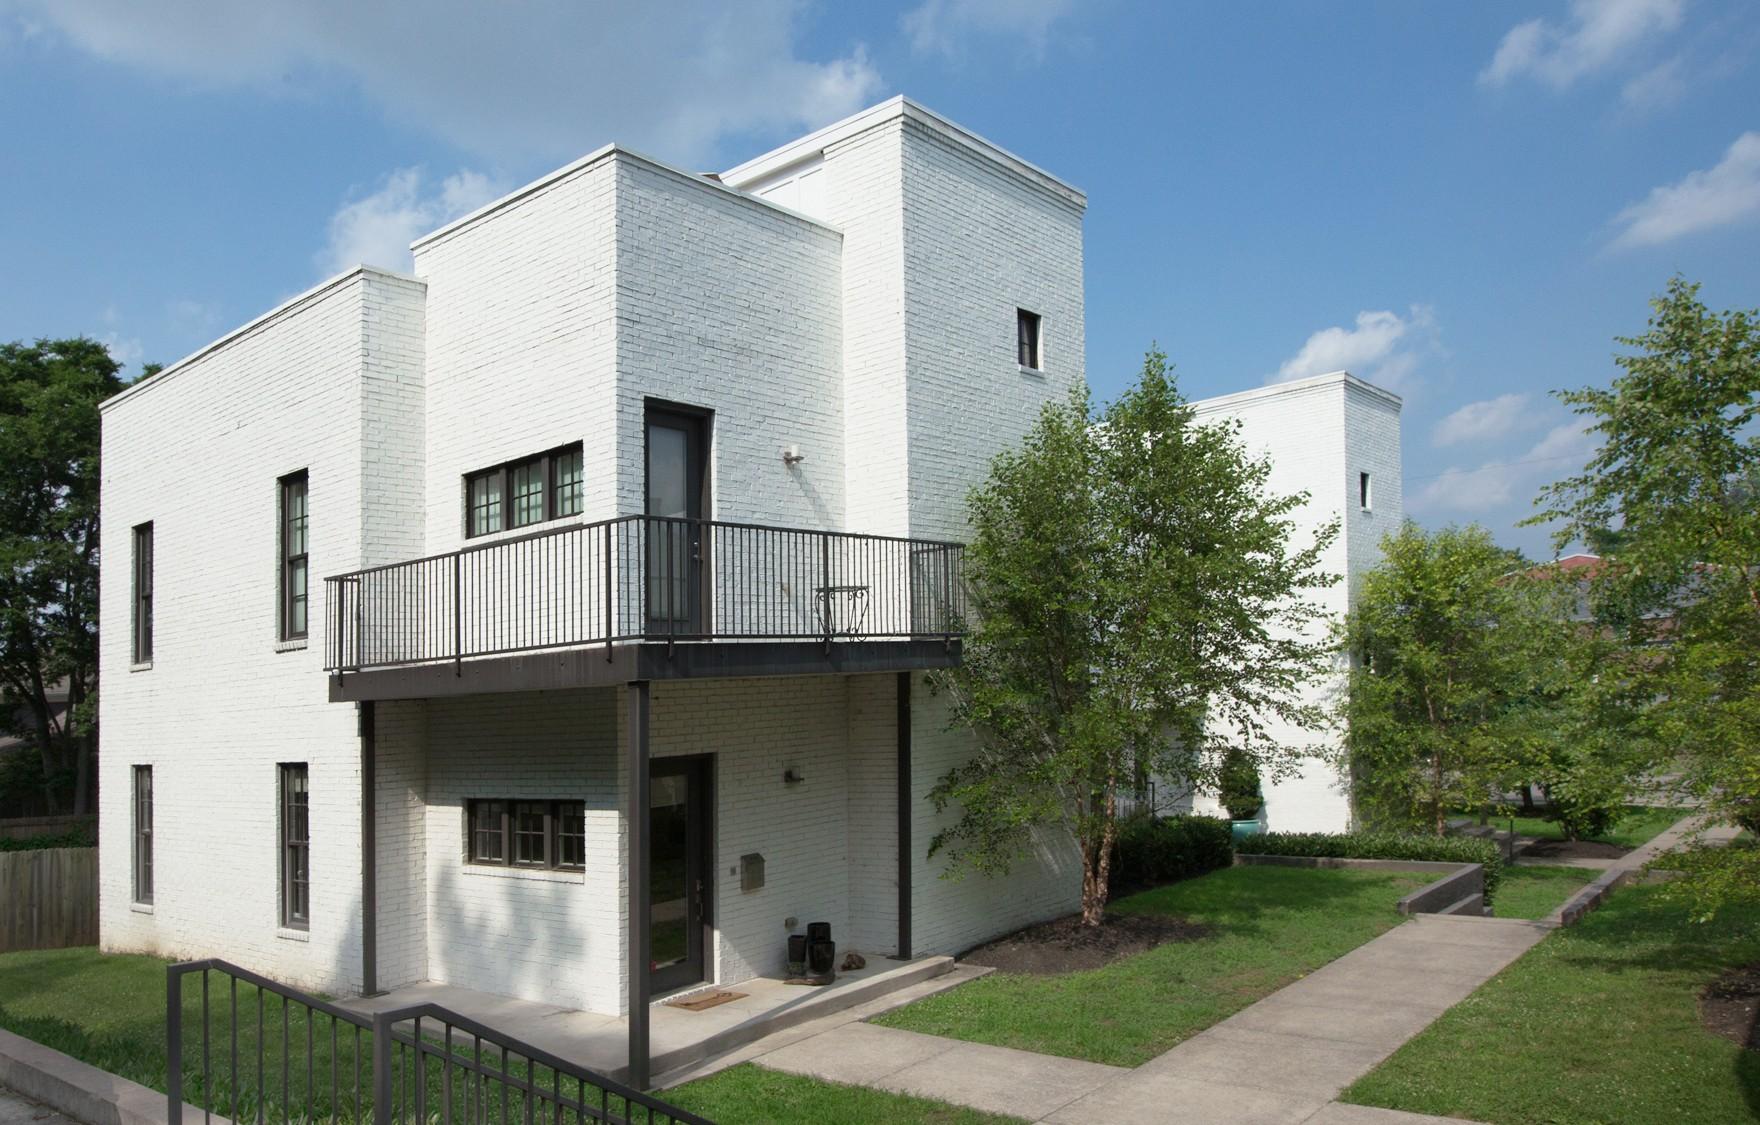 2111B 10th Ave, S Property Photo - Nashville, TN real estate listing